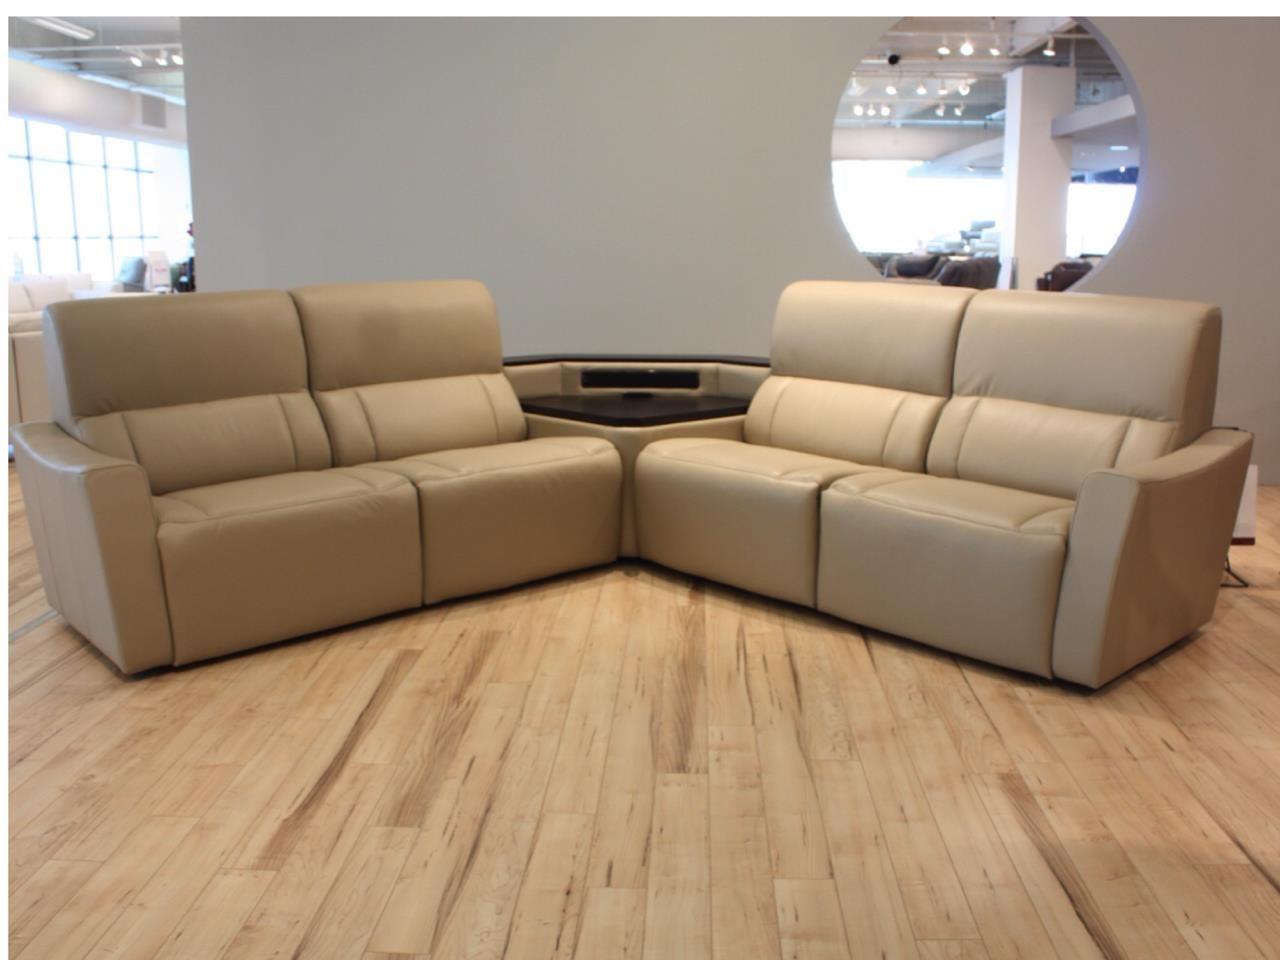 Palliser Motivo 41965 70 B9 6p 7p 5 Piece Leather Reclining